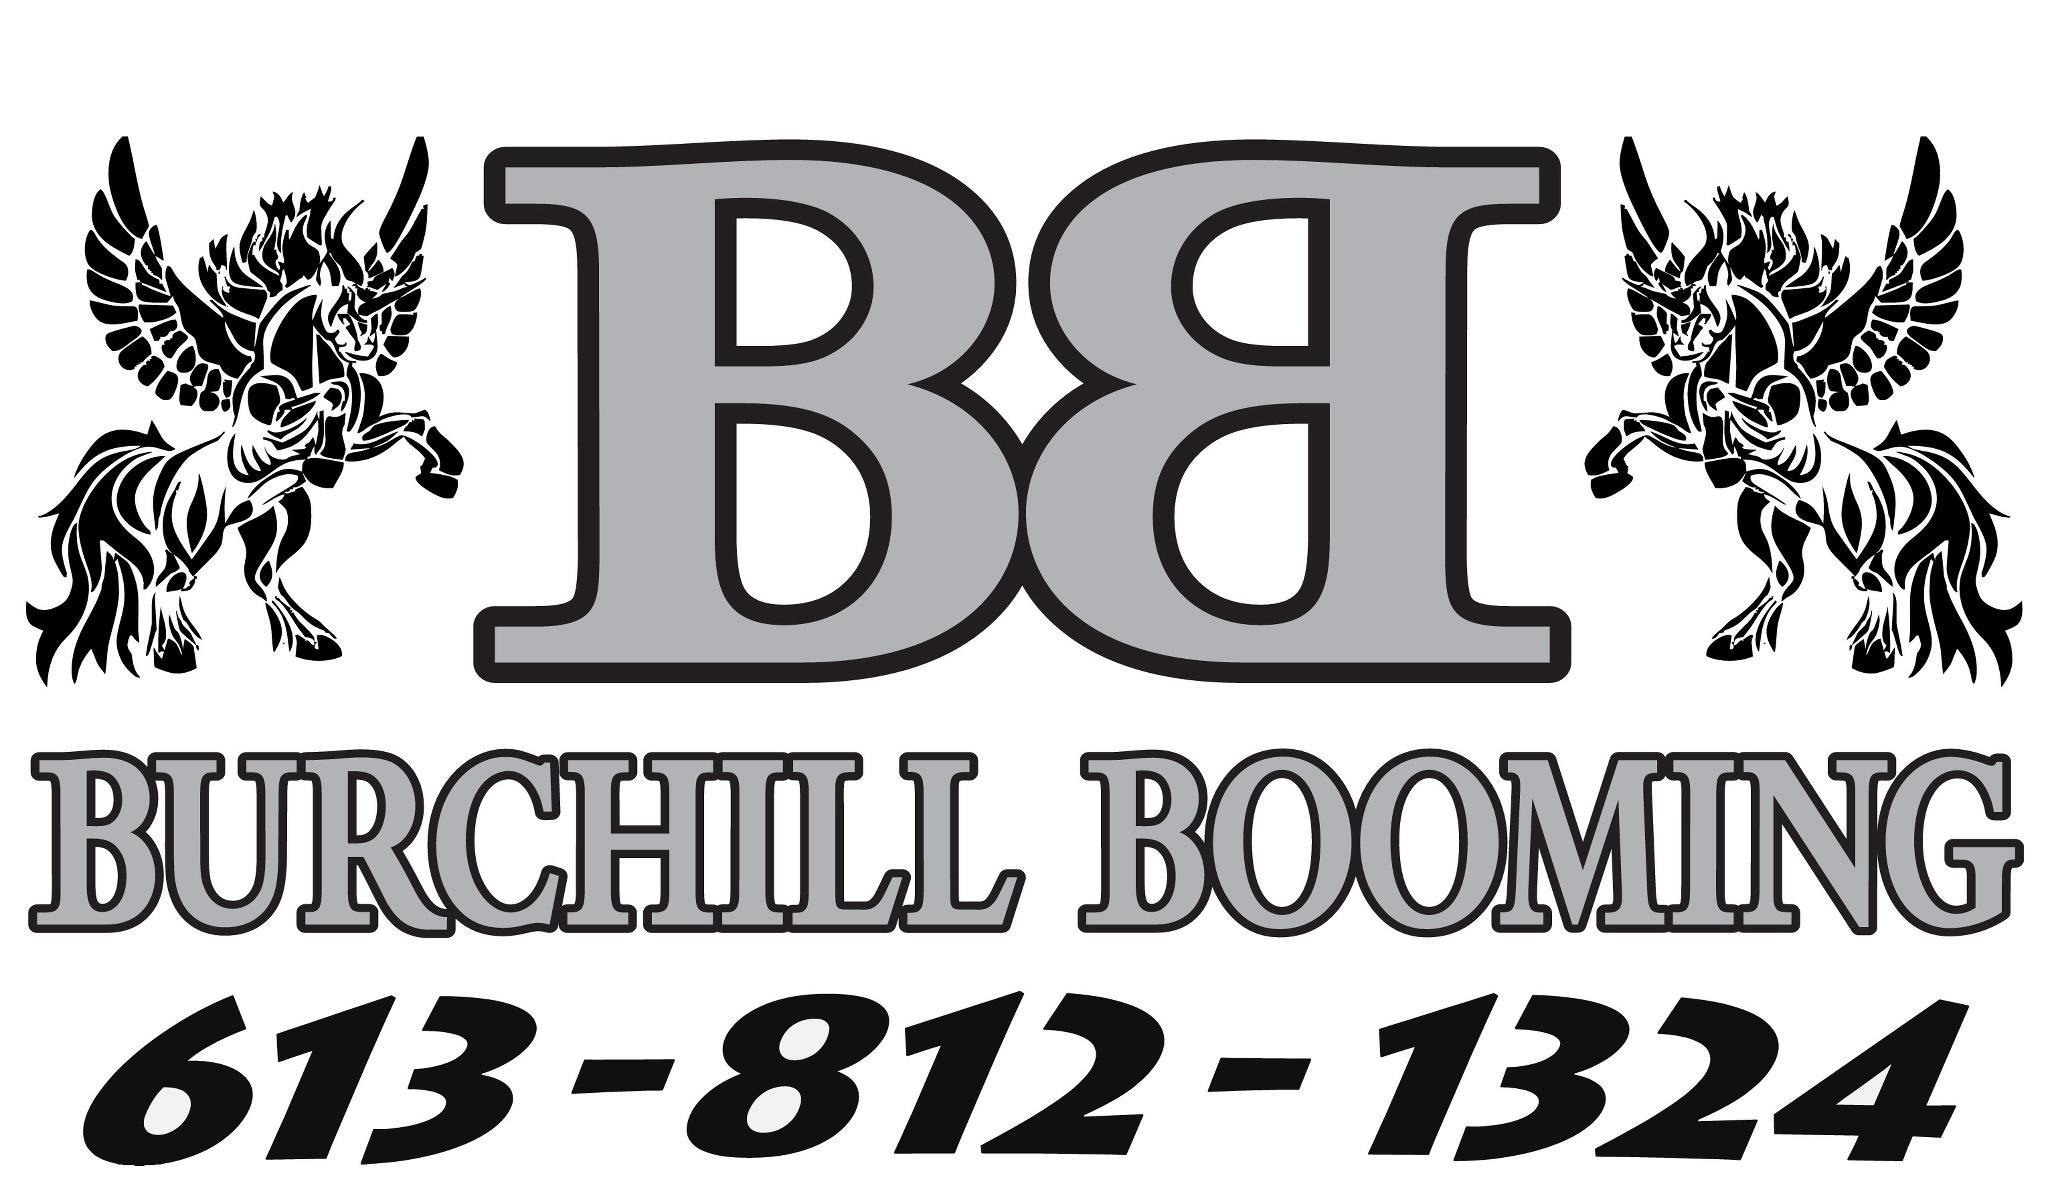 Burchill Booming